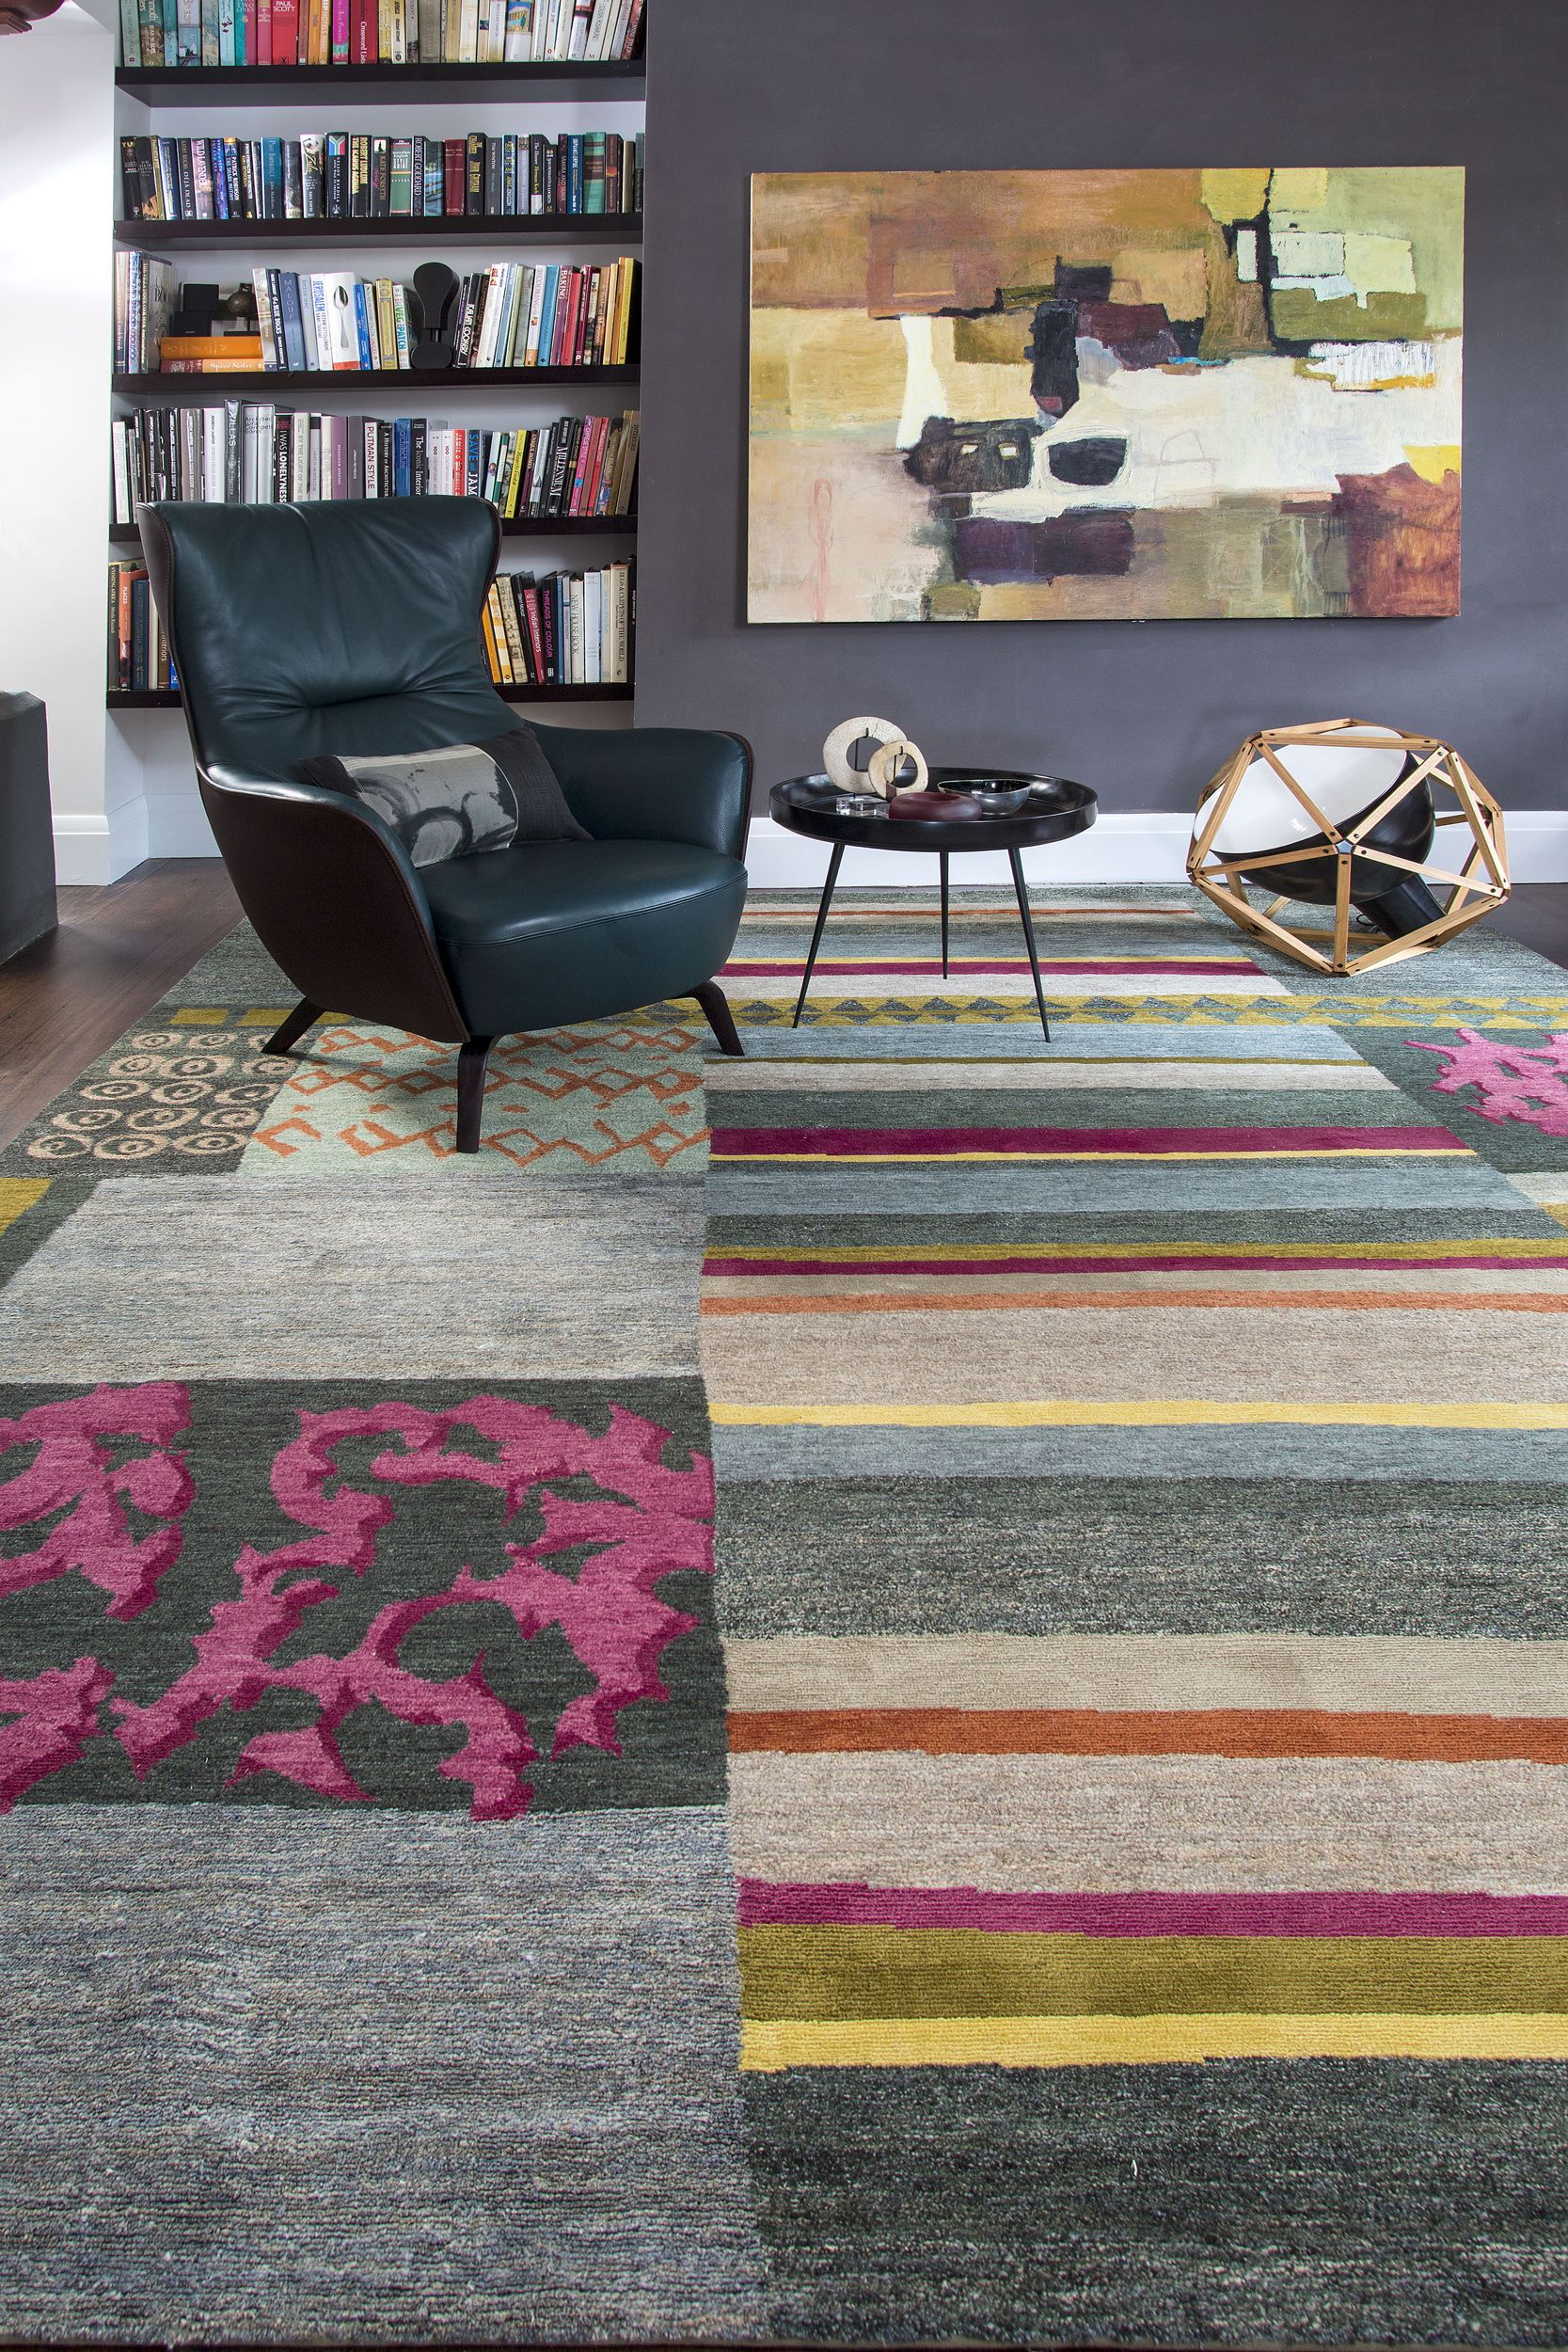 Memory Meryl Hare S Design Studio Has Just Released A Signature Rug Collection In Collaboration With Designer Rug Australian Design Rug Design Design Studio